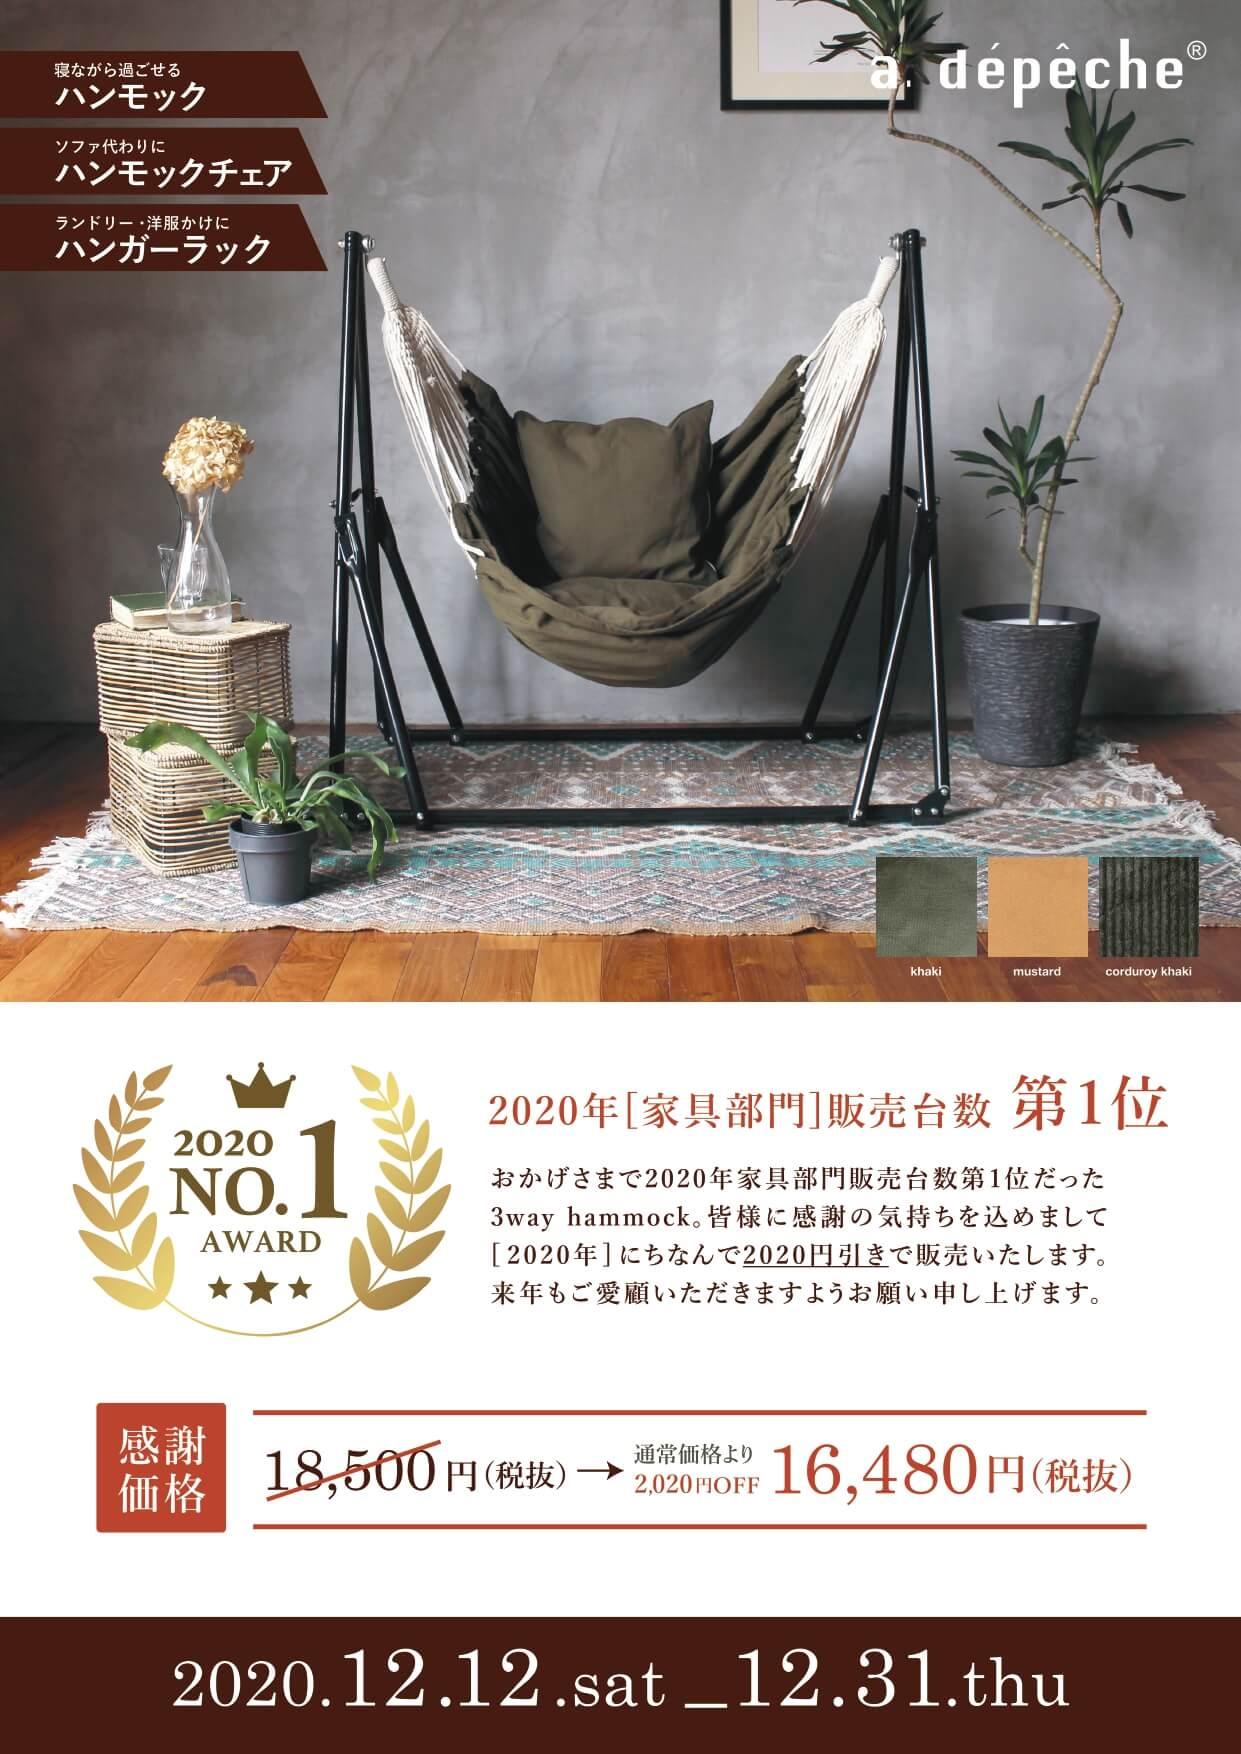 3wayハンモック期間限定2020円引きで販売!